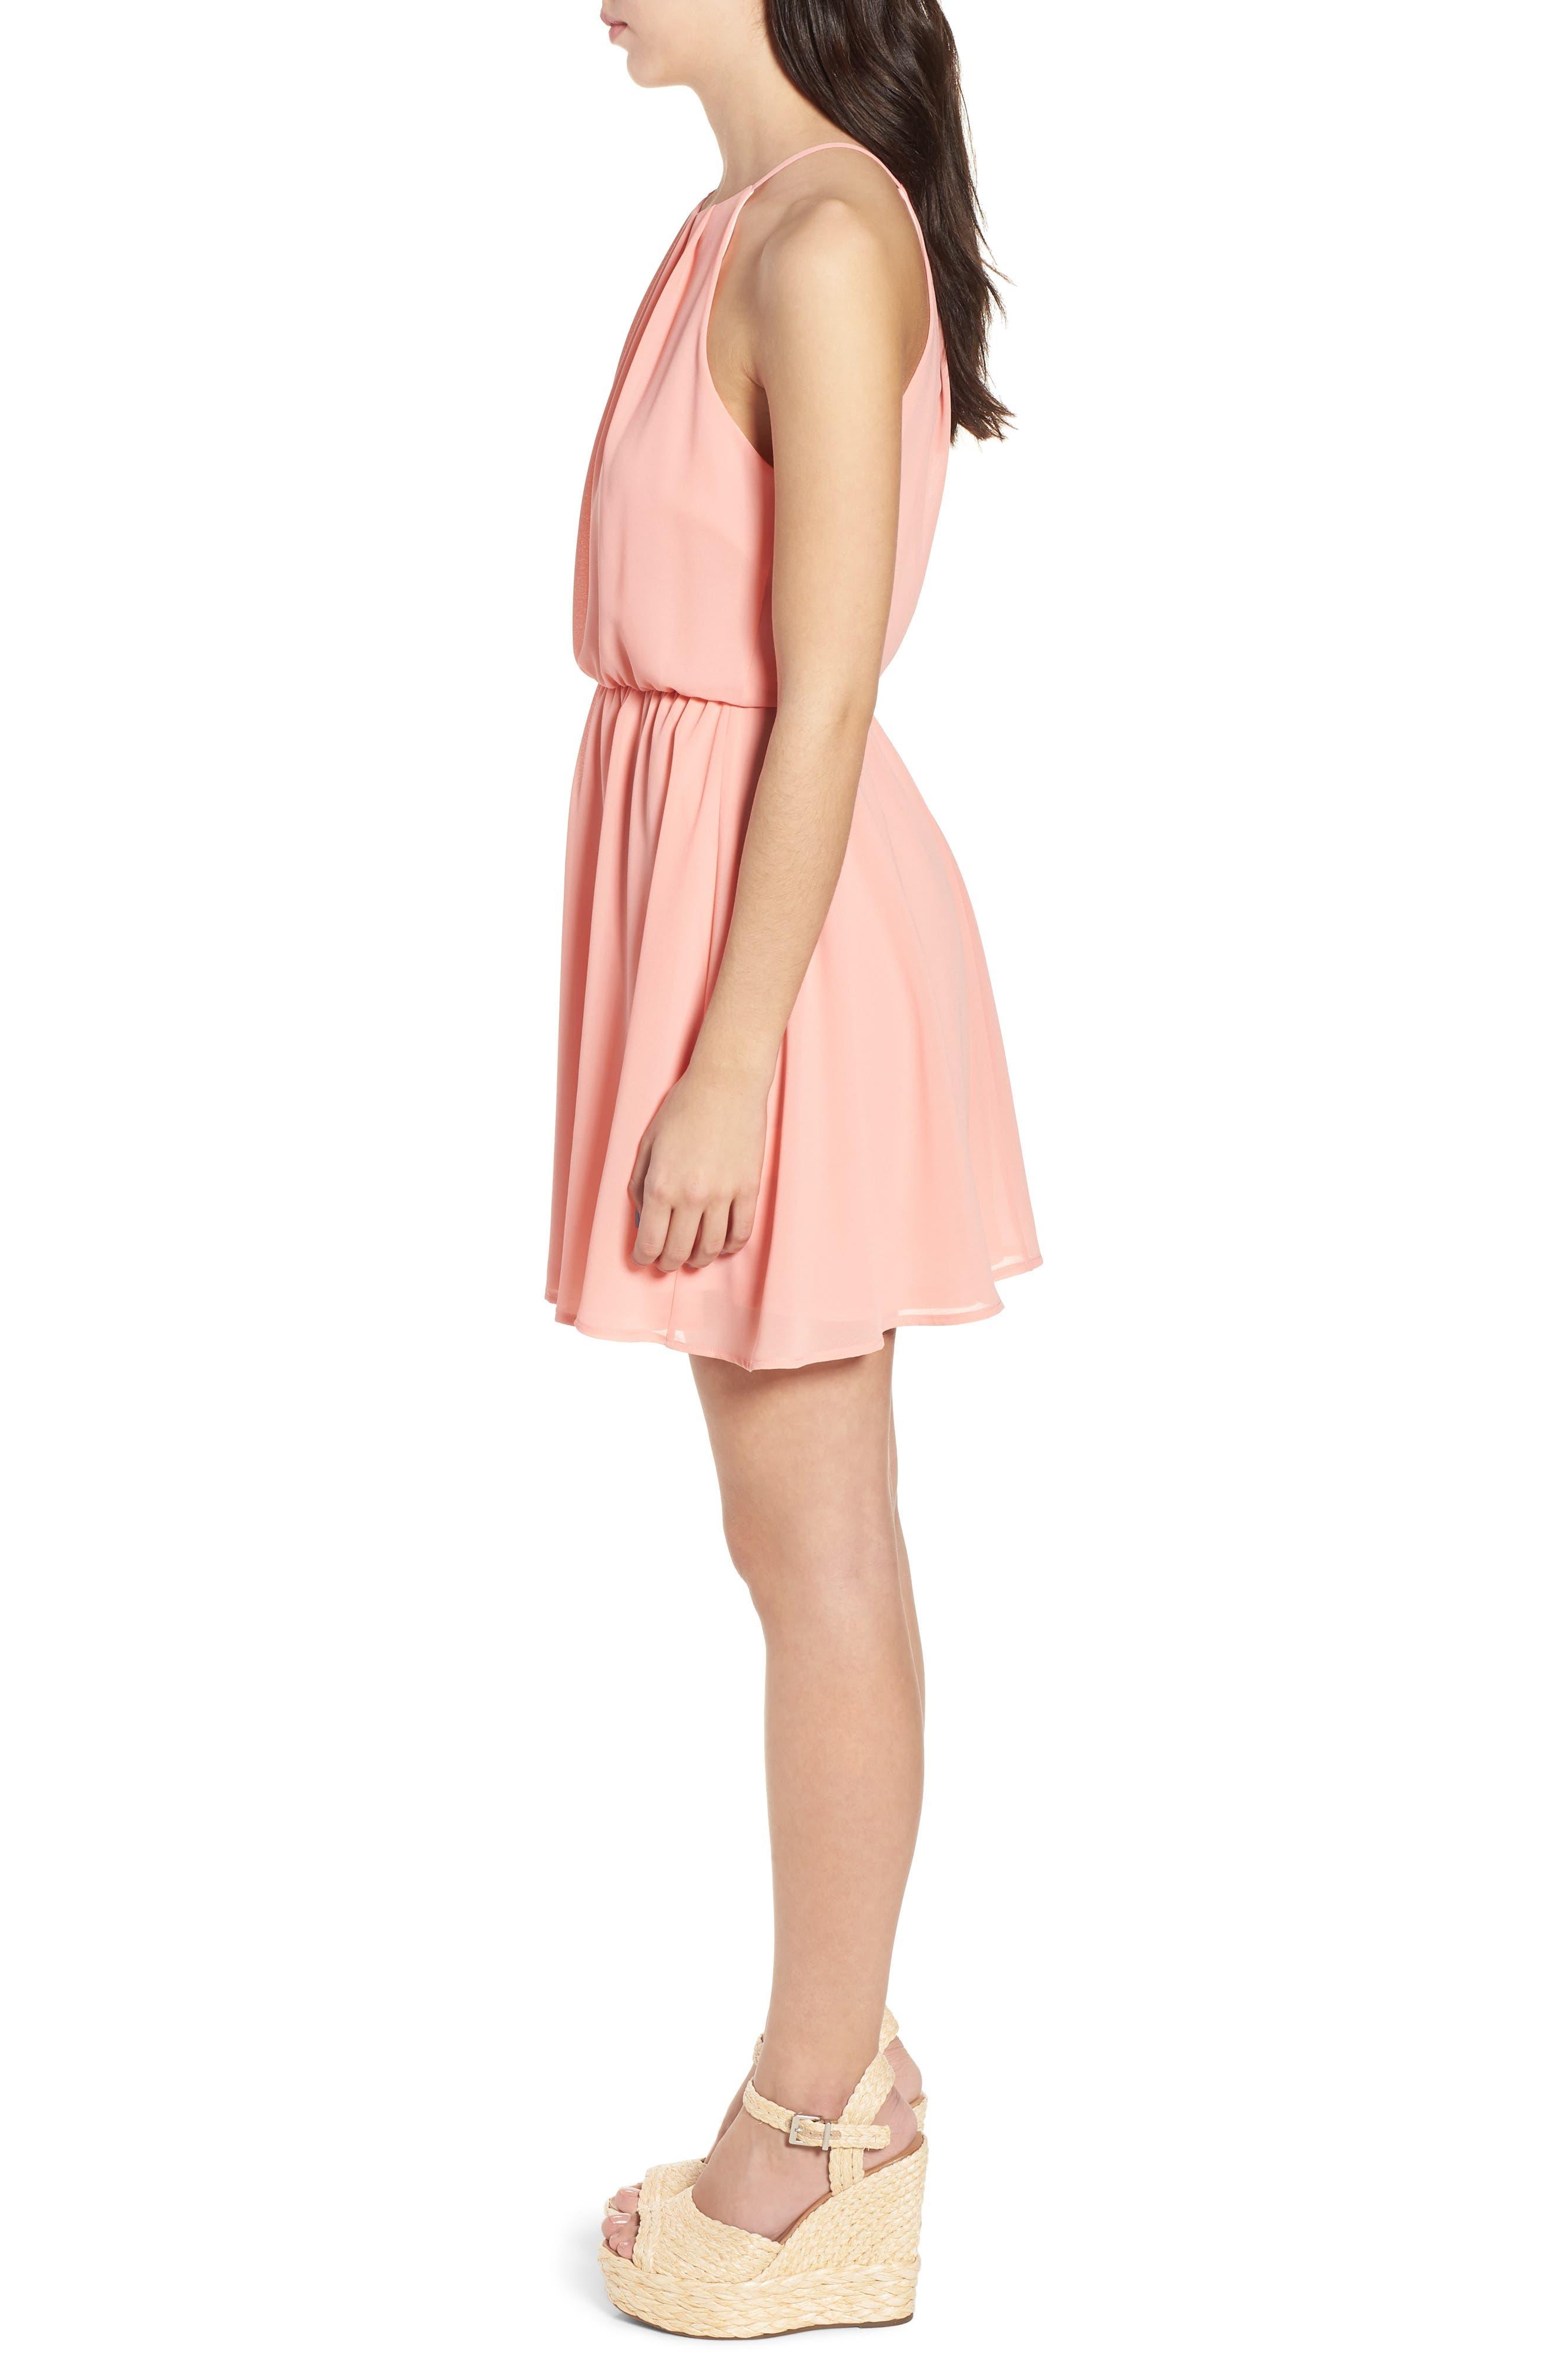 Blouson Chiffon Skater Dress,                             Alternate thumbnail 4, color,                             Peach